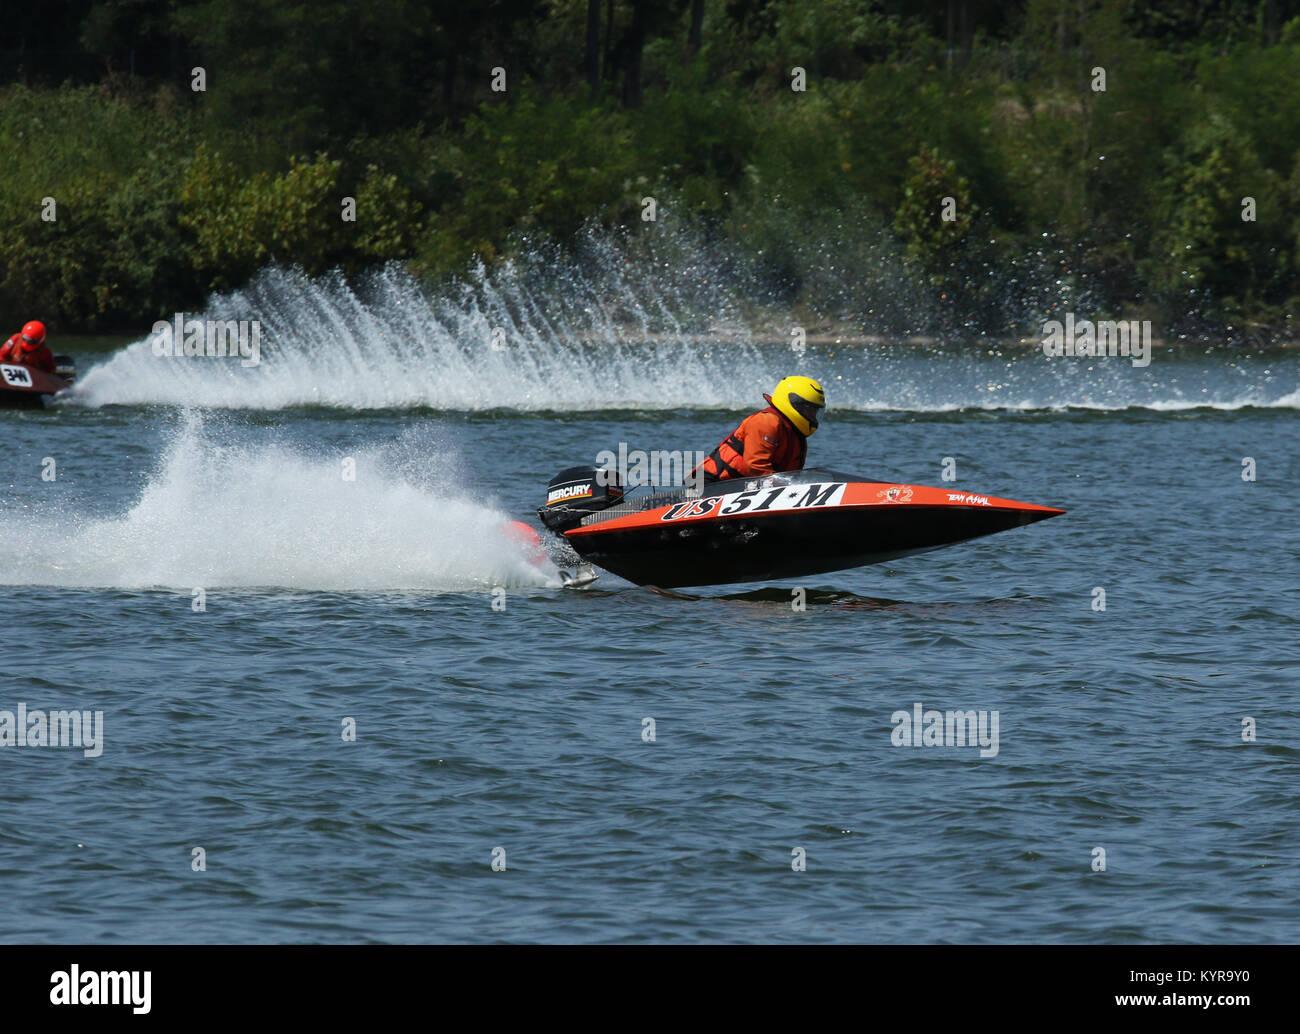 Boat 51M. Outboard Hydroplane boat races. Dayton Record Runs Regatta. Eastwood Lake, Dayton, Ohio, USA. - Stock Image